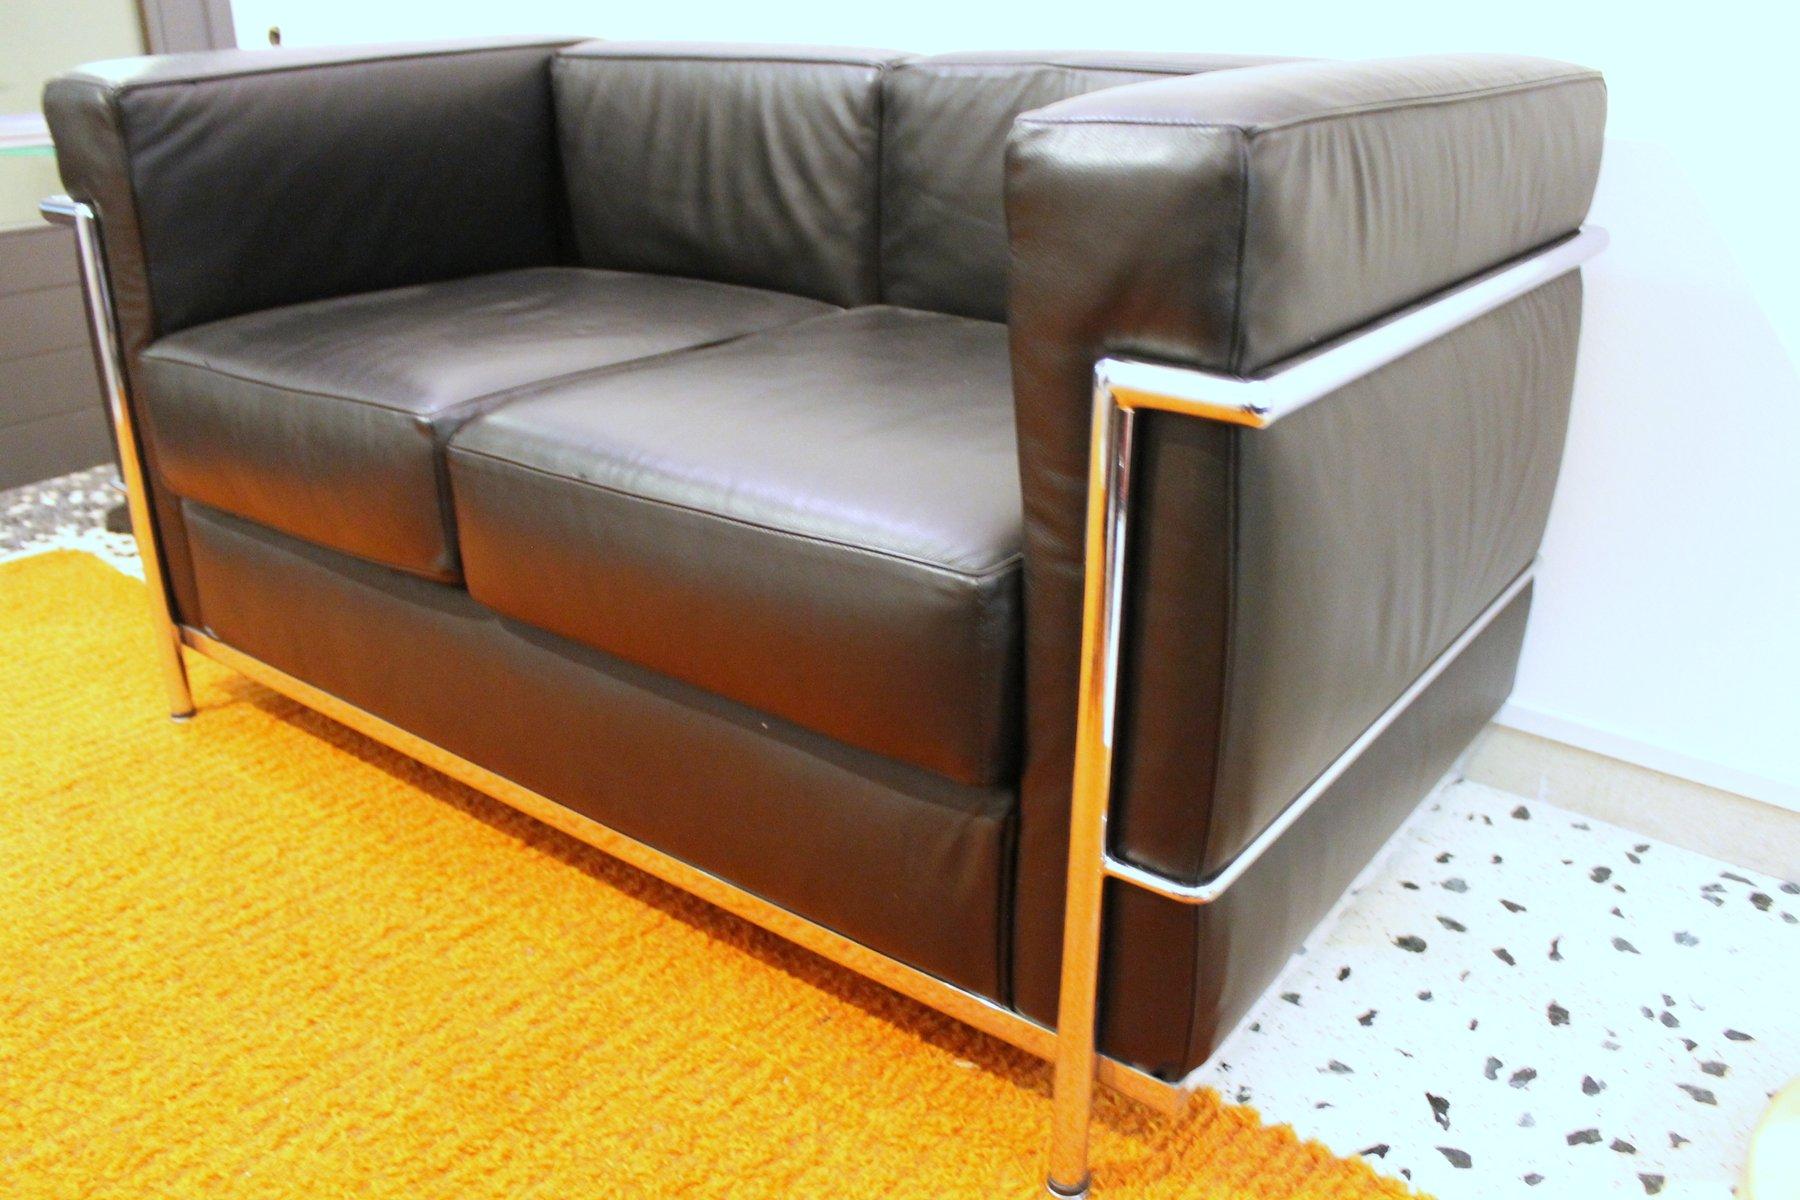 lc2 sofa von le corbusier f r alivar 1989 bei pamono kaufen. Black Bedroom Furniture Sets. Home Design Ideas